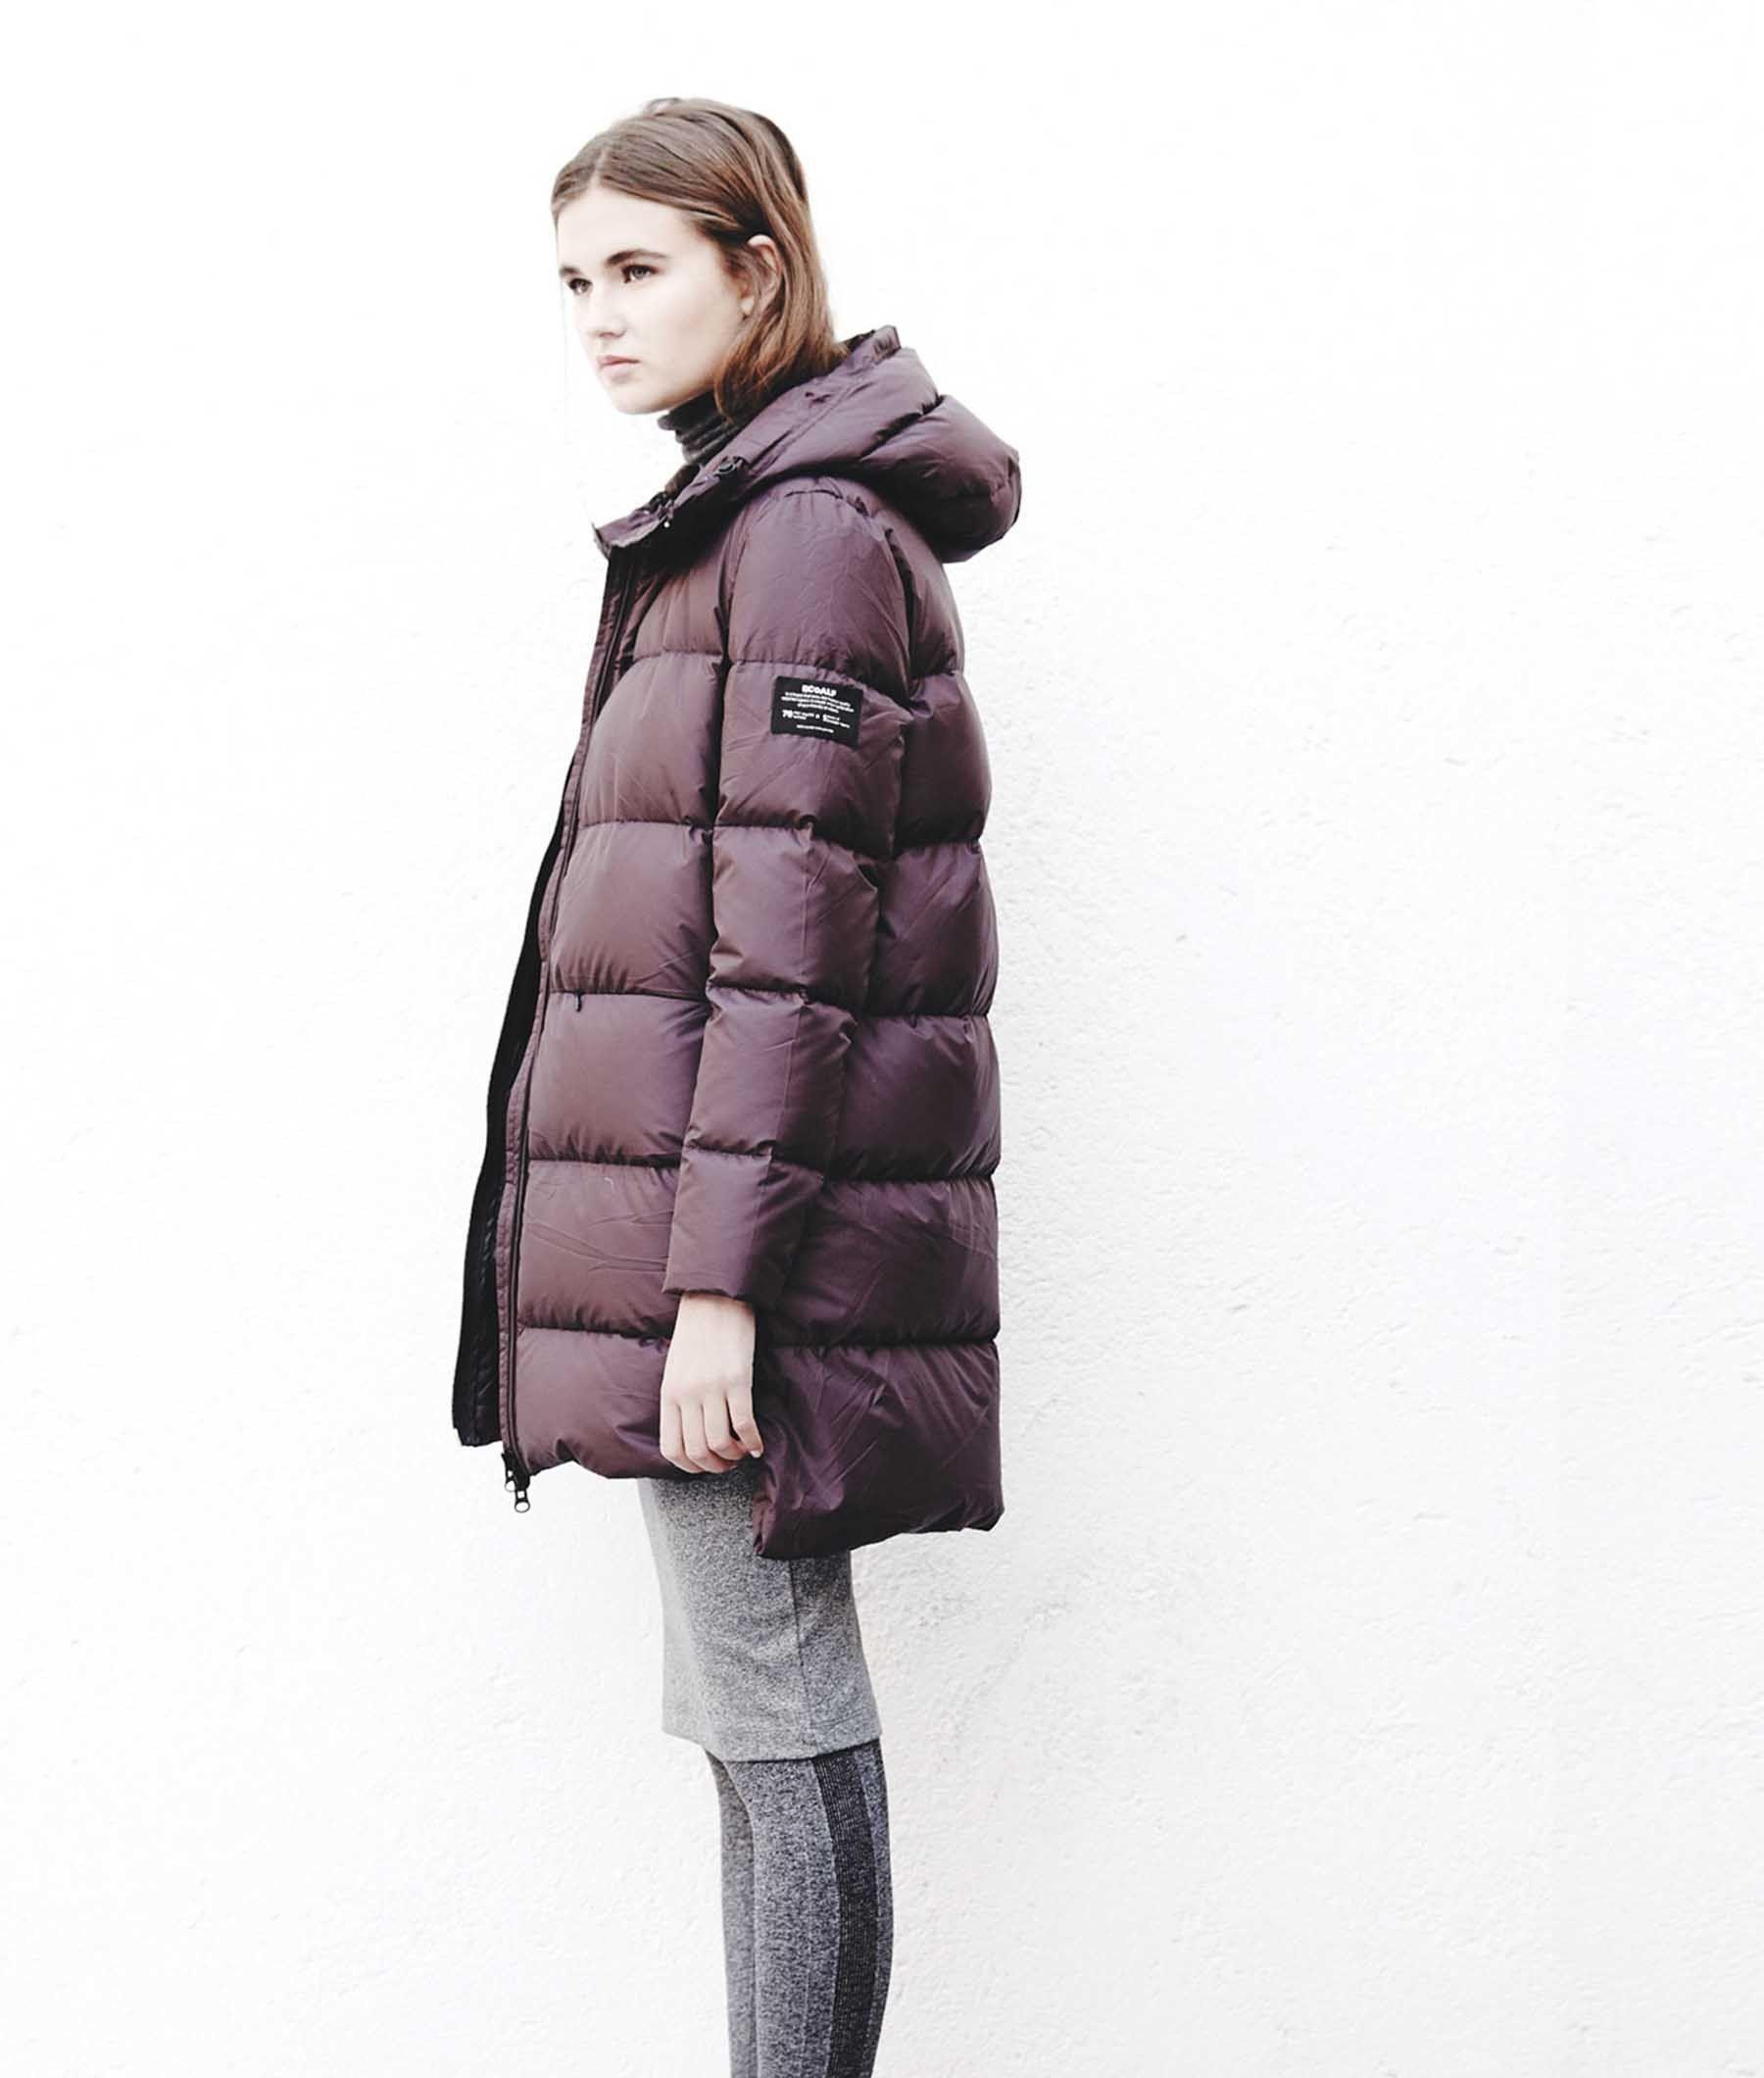 Fashion Brands That Recycle Plastic Bottles Into Clothing Coats For Women Coats Jackets Women Burgundy Coats [ 2120 x 1800 Pixel ]